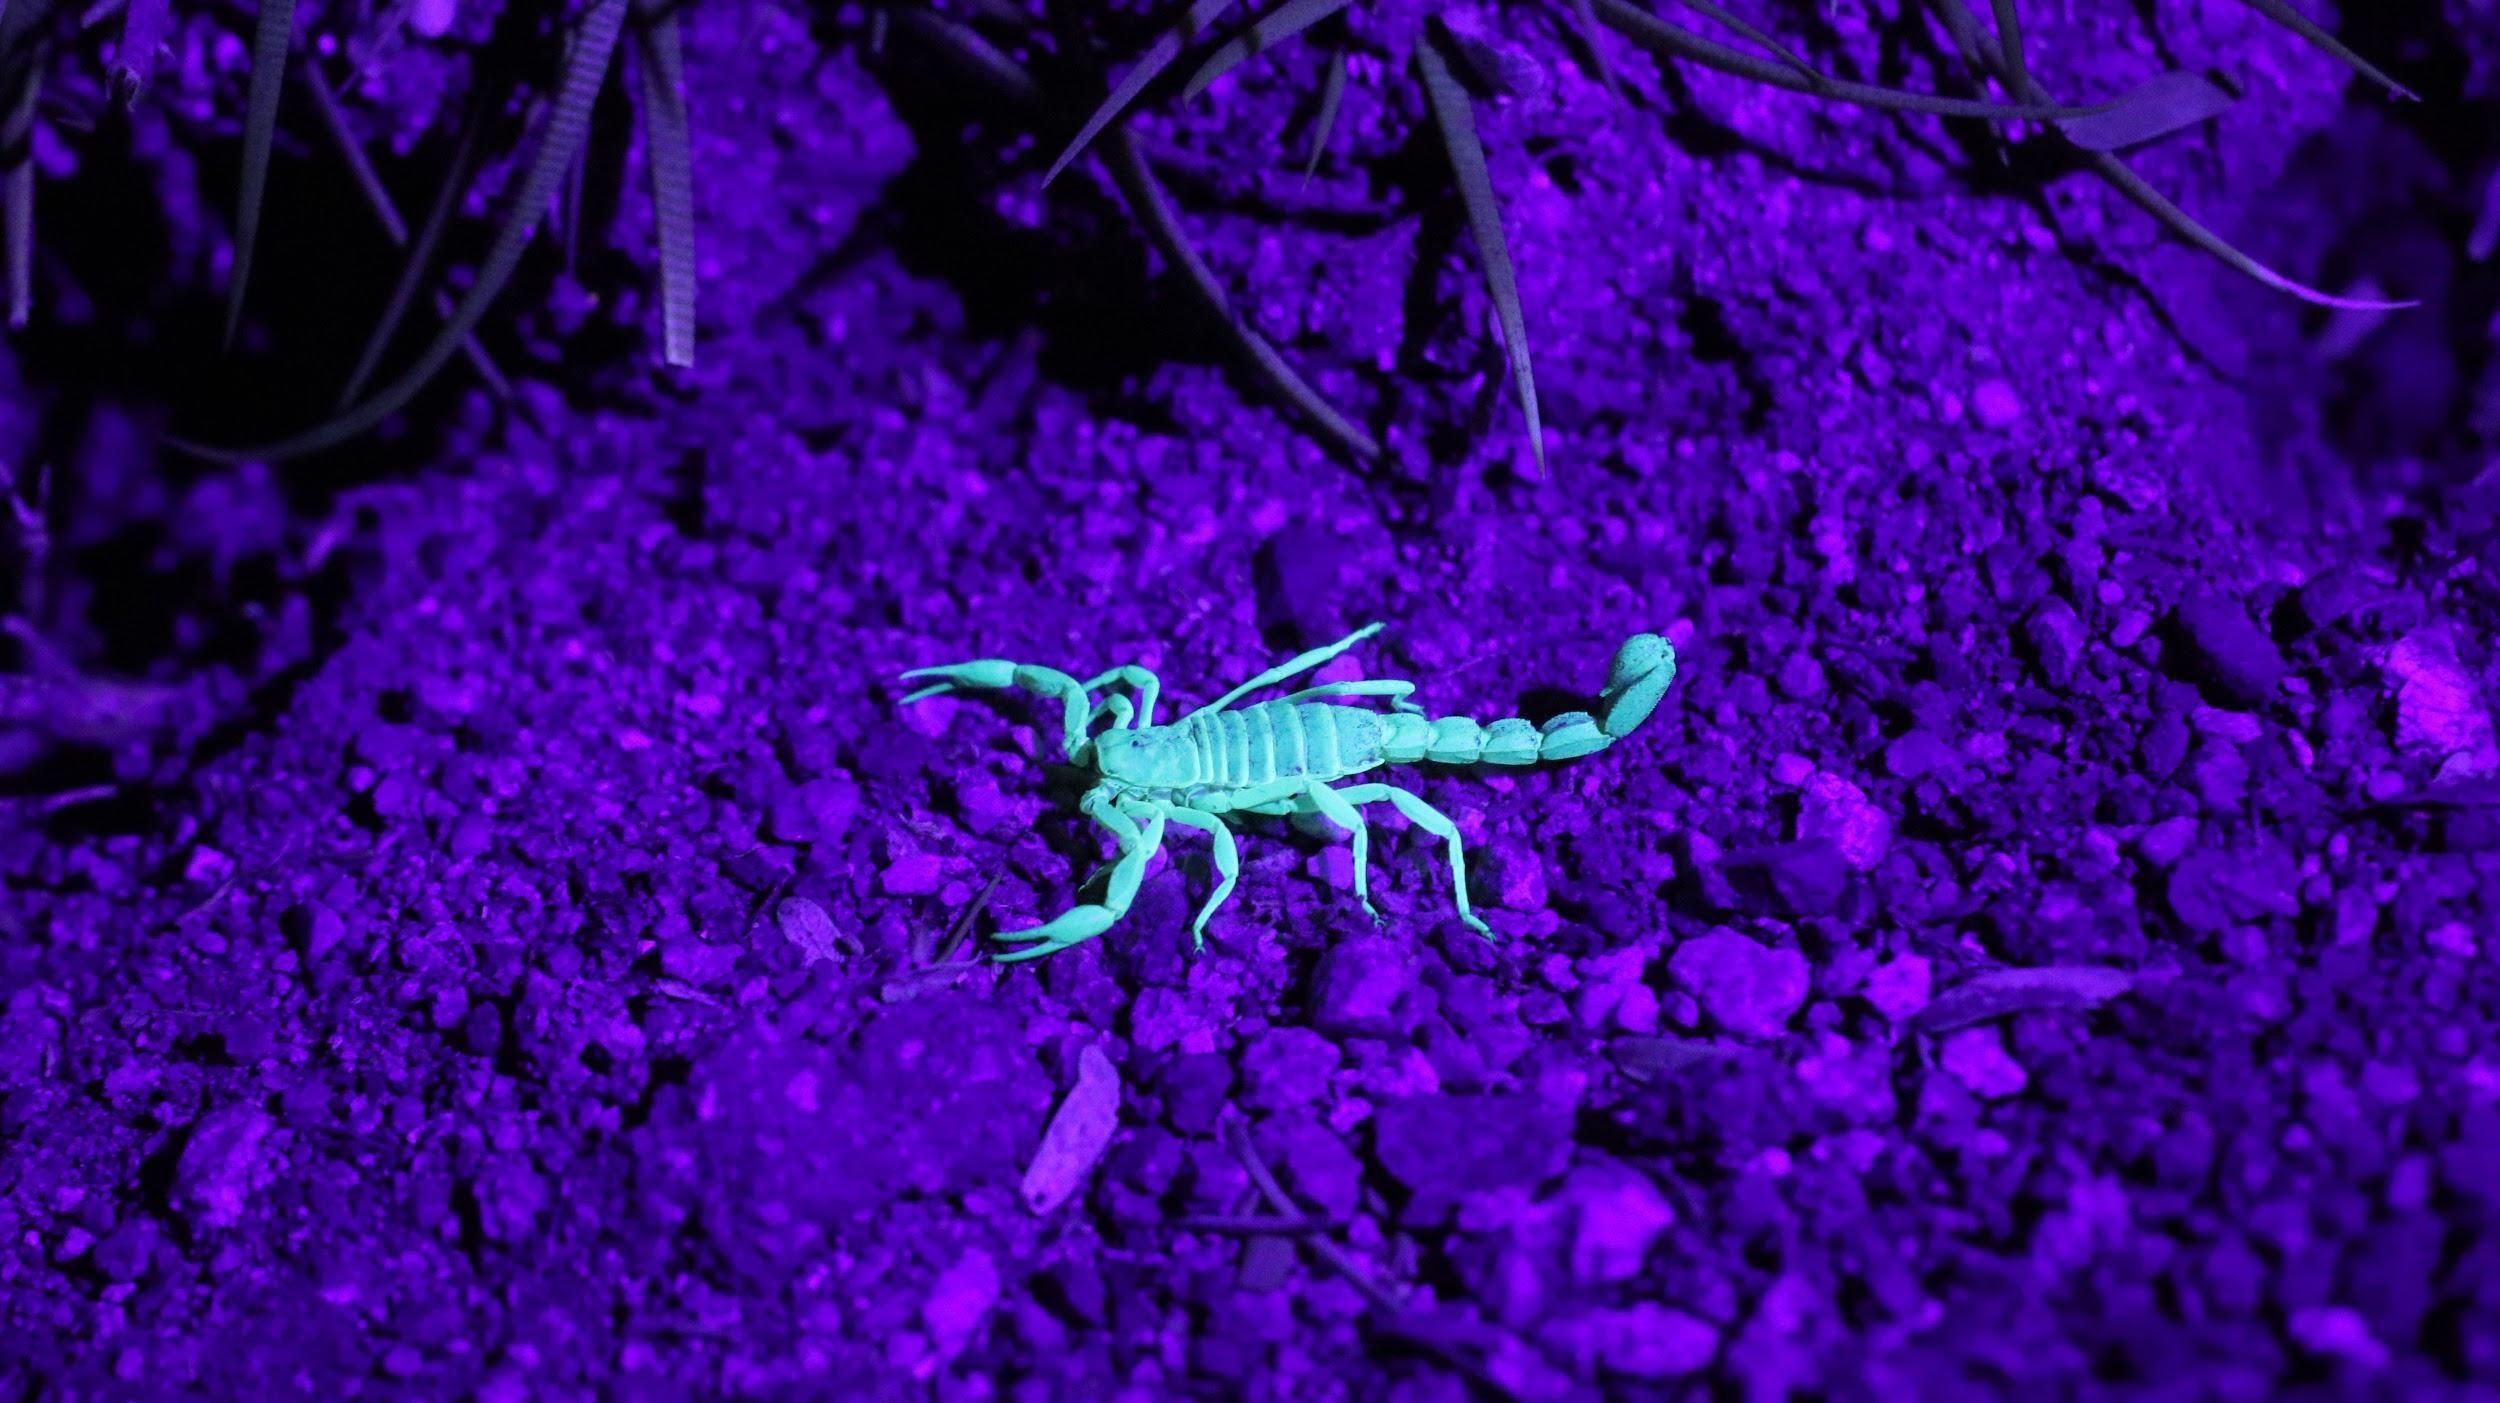 Scorpion Nesting Habits